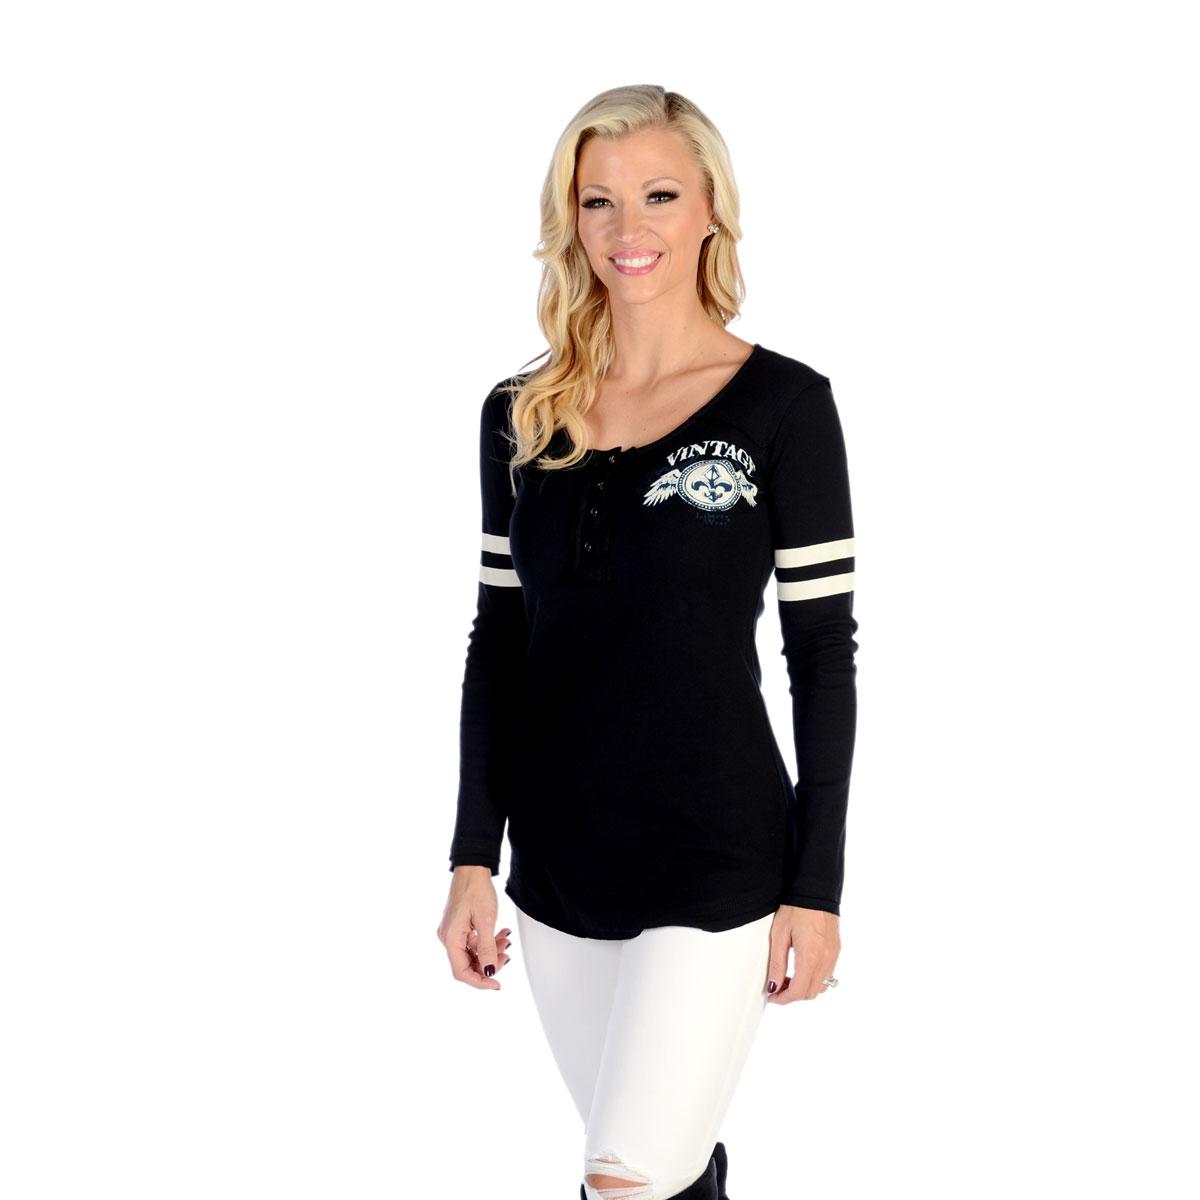 a6a1ee55003 Liberty Wear Women s Vintage Love Black Long-Sleeved T-Shirt - 7296 ...